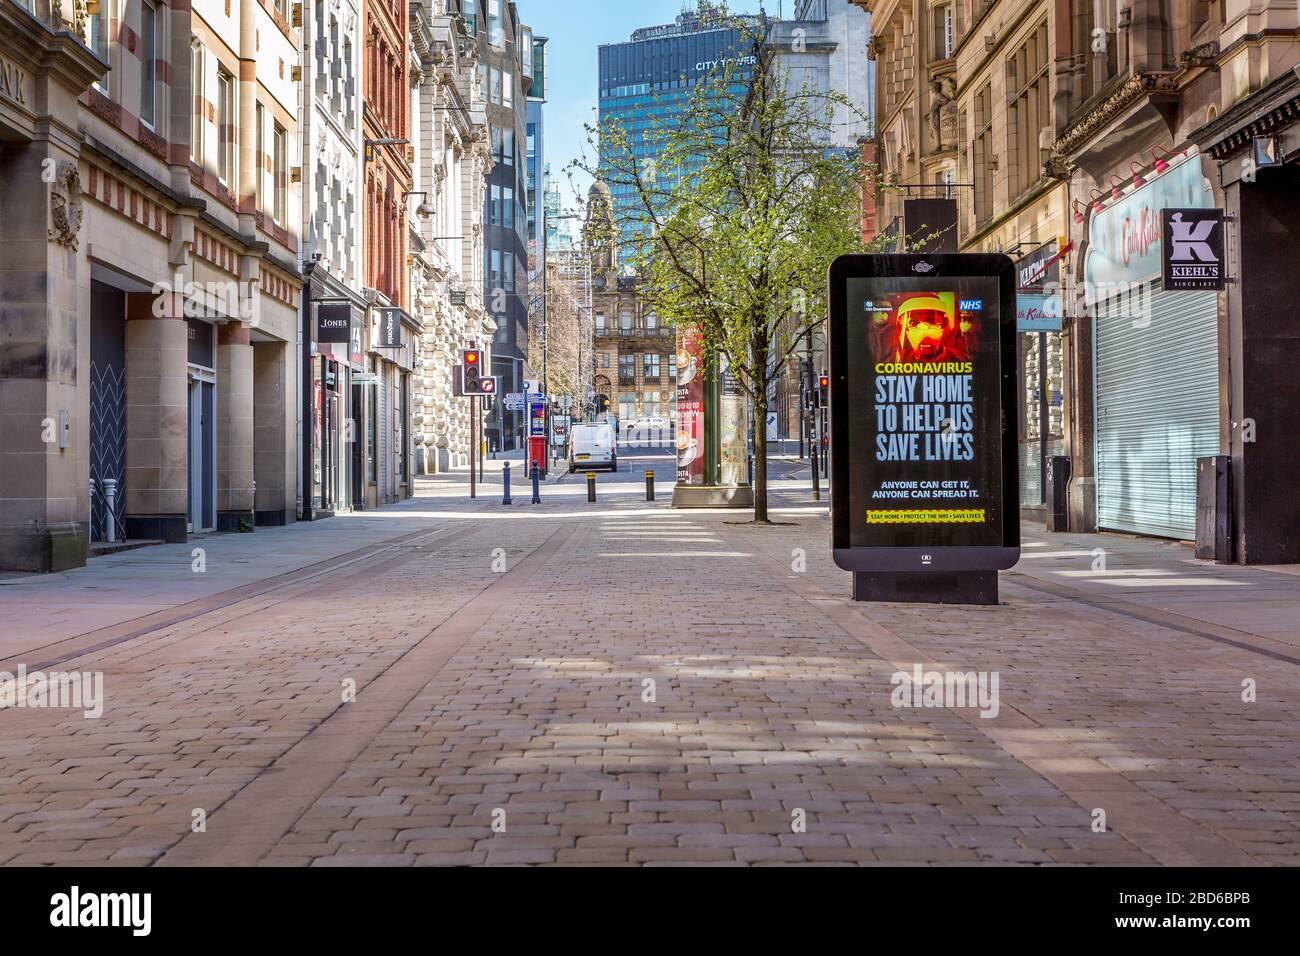 Señales DE 'Stay Home Save Lives', brote de coronavirus, King Street, Manchester City Center, Reino Unido, abril de 2020. Foto de stock